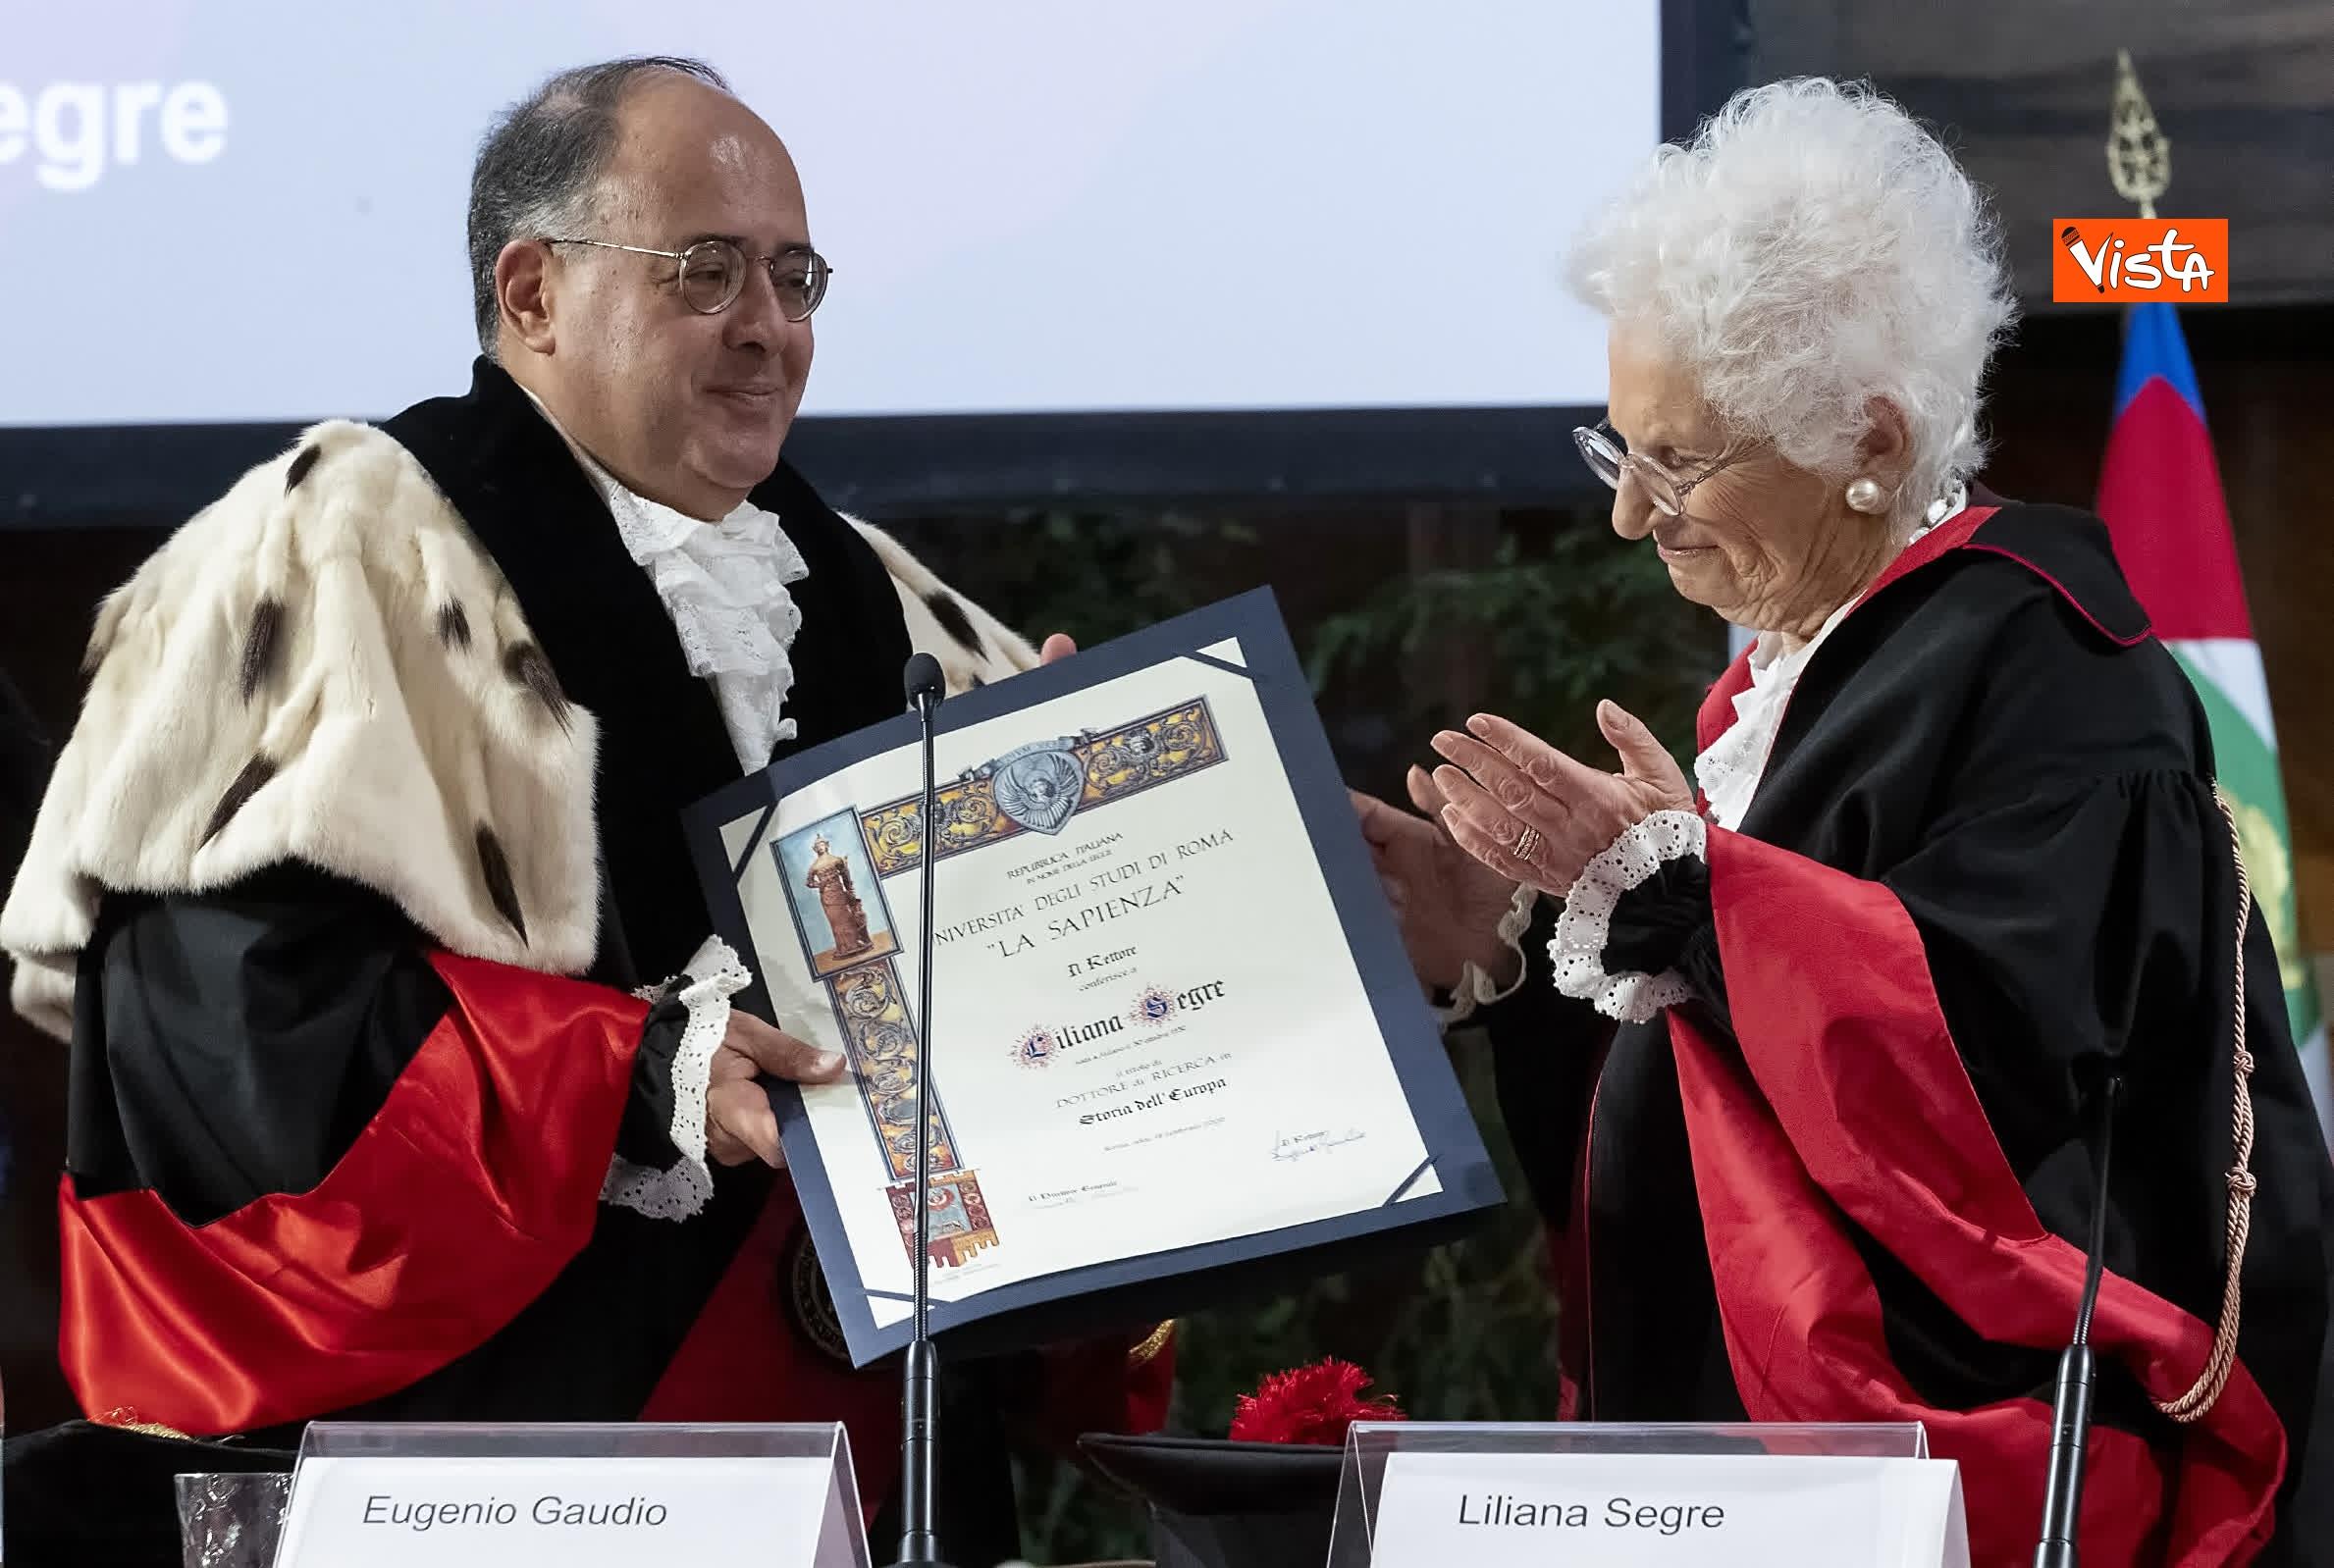 17-02-20 Segre riceve laurea honoris causa dal rettore della Sapienza Gaudio_04